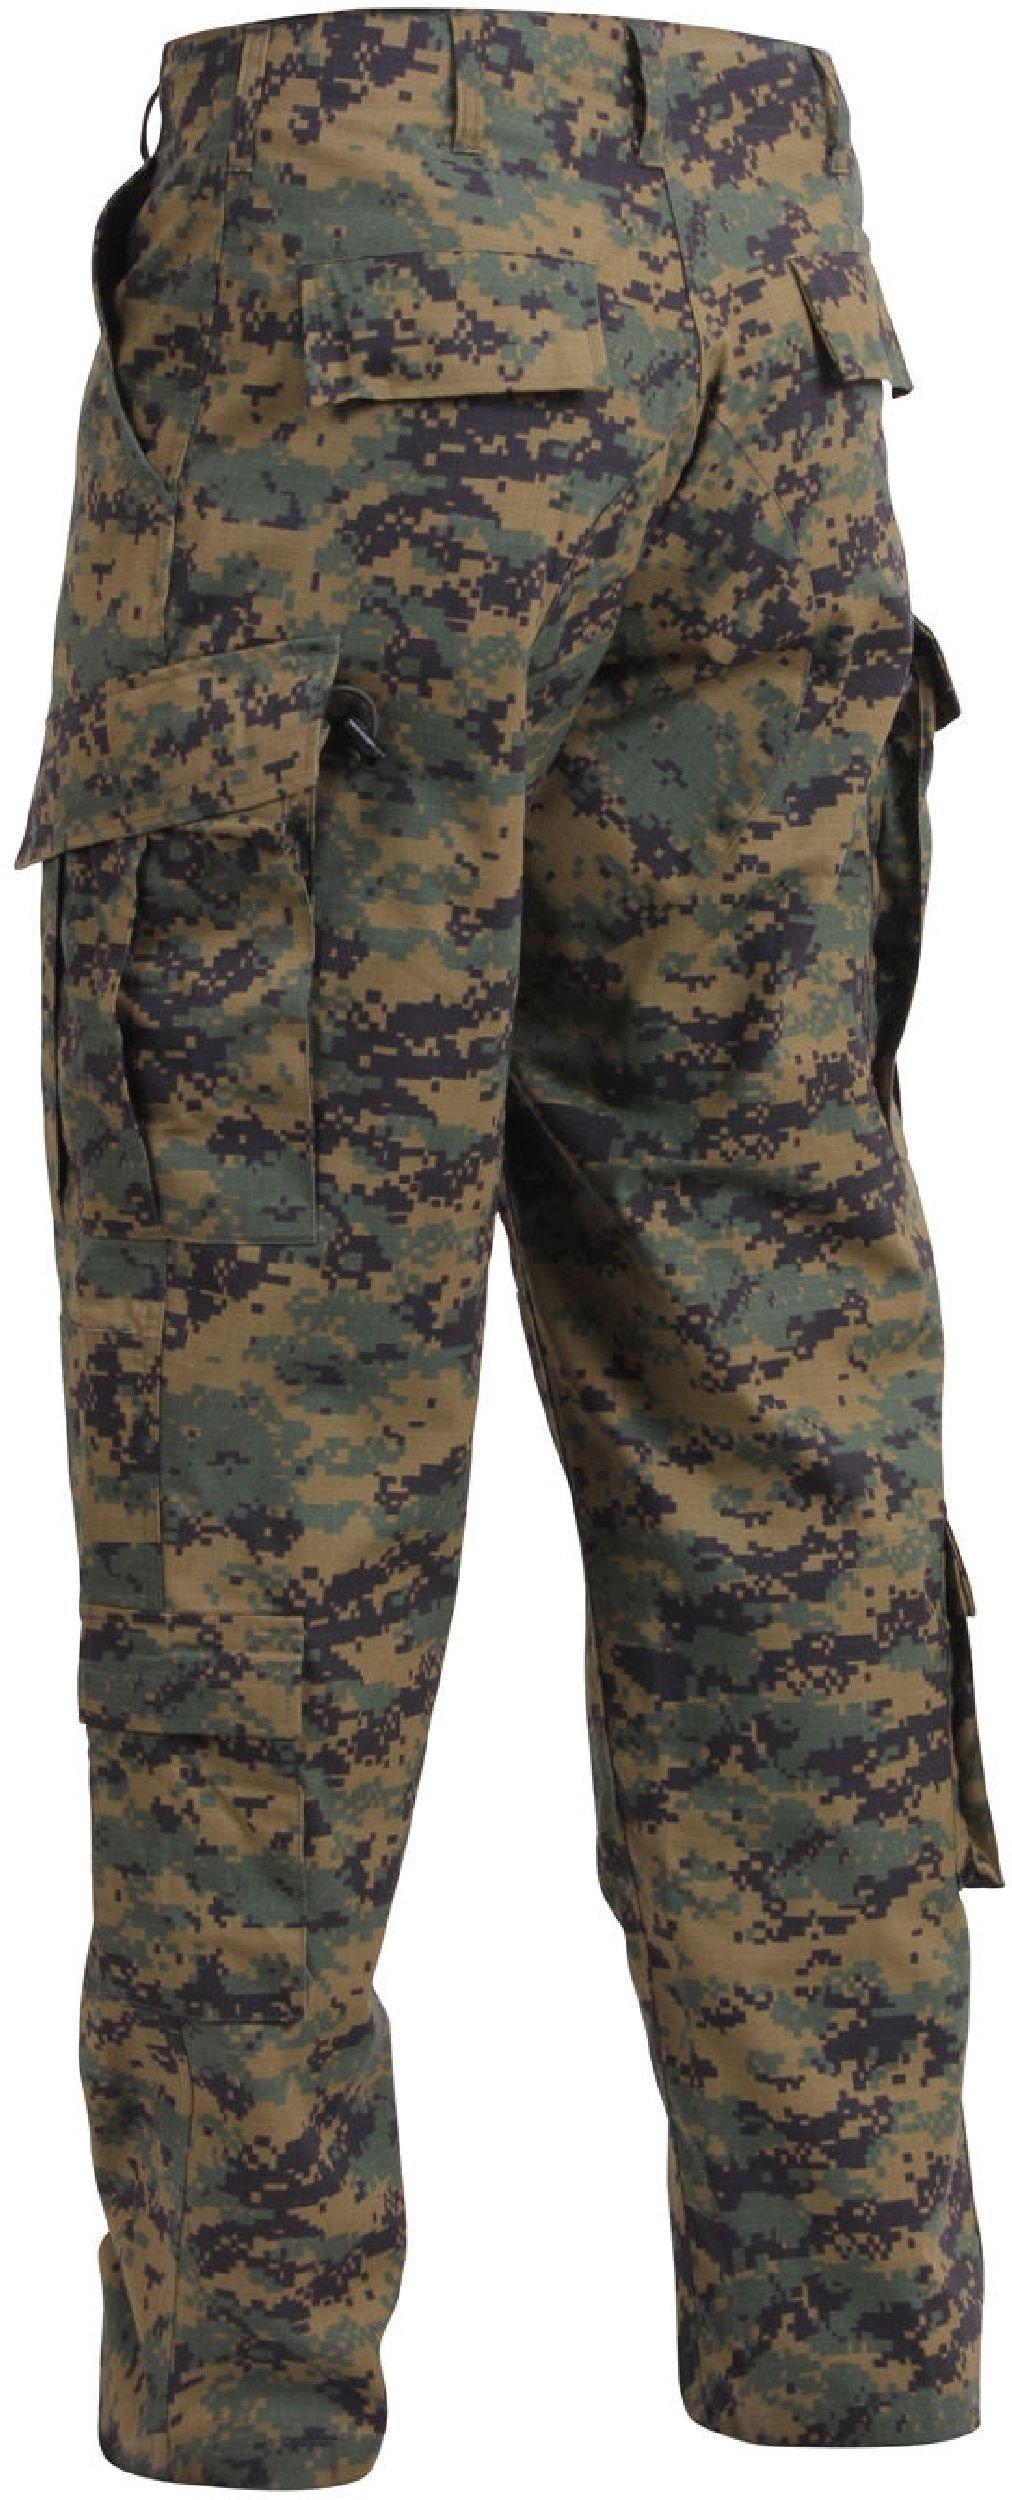 Woodland Digital Camouflage Combat Tactical Military Uniform